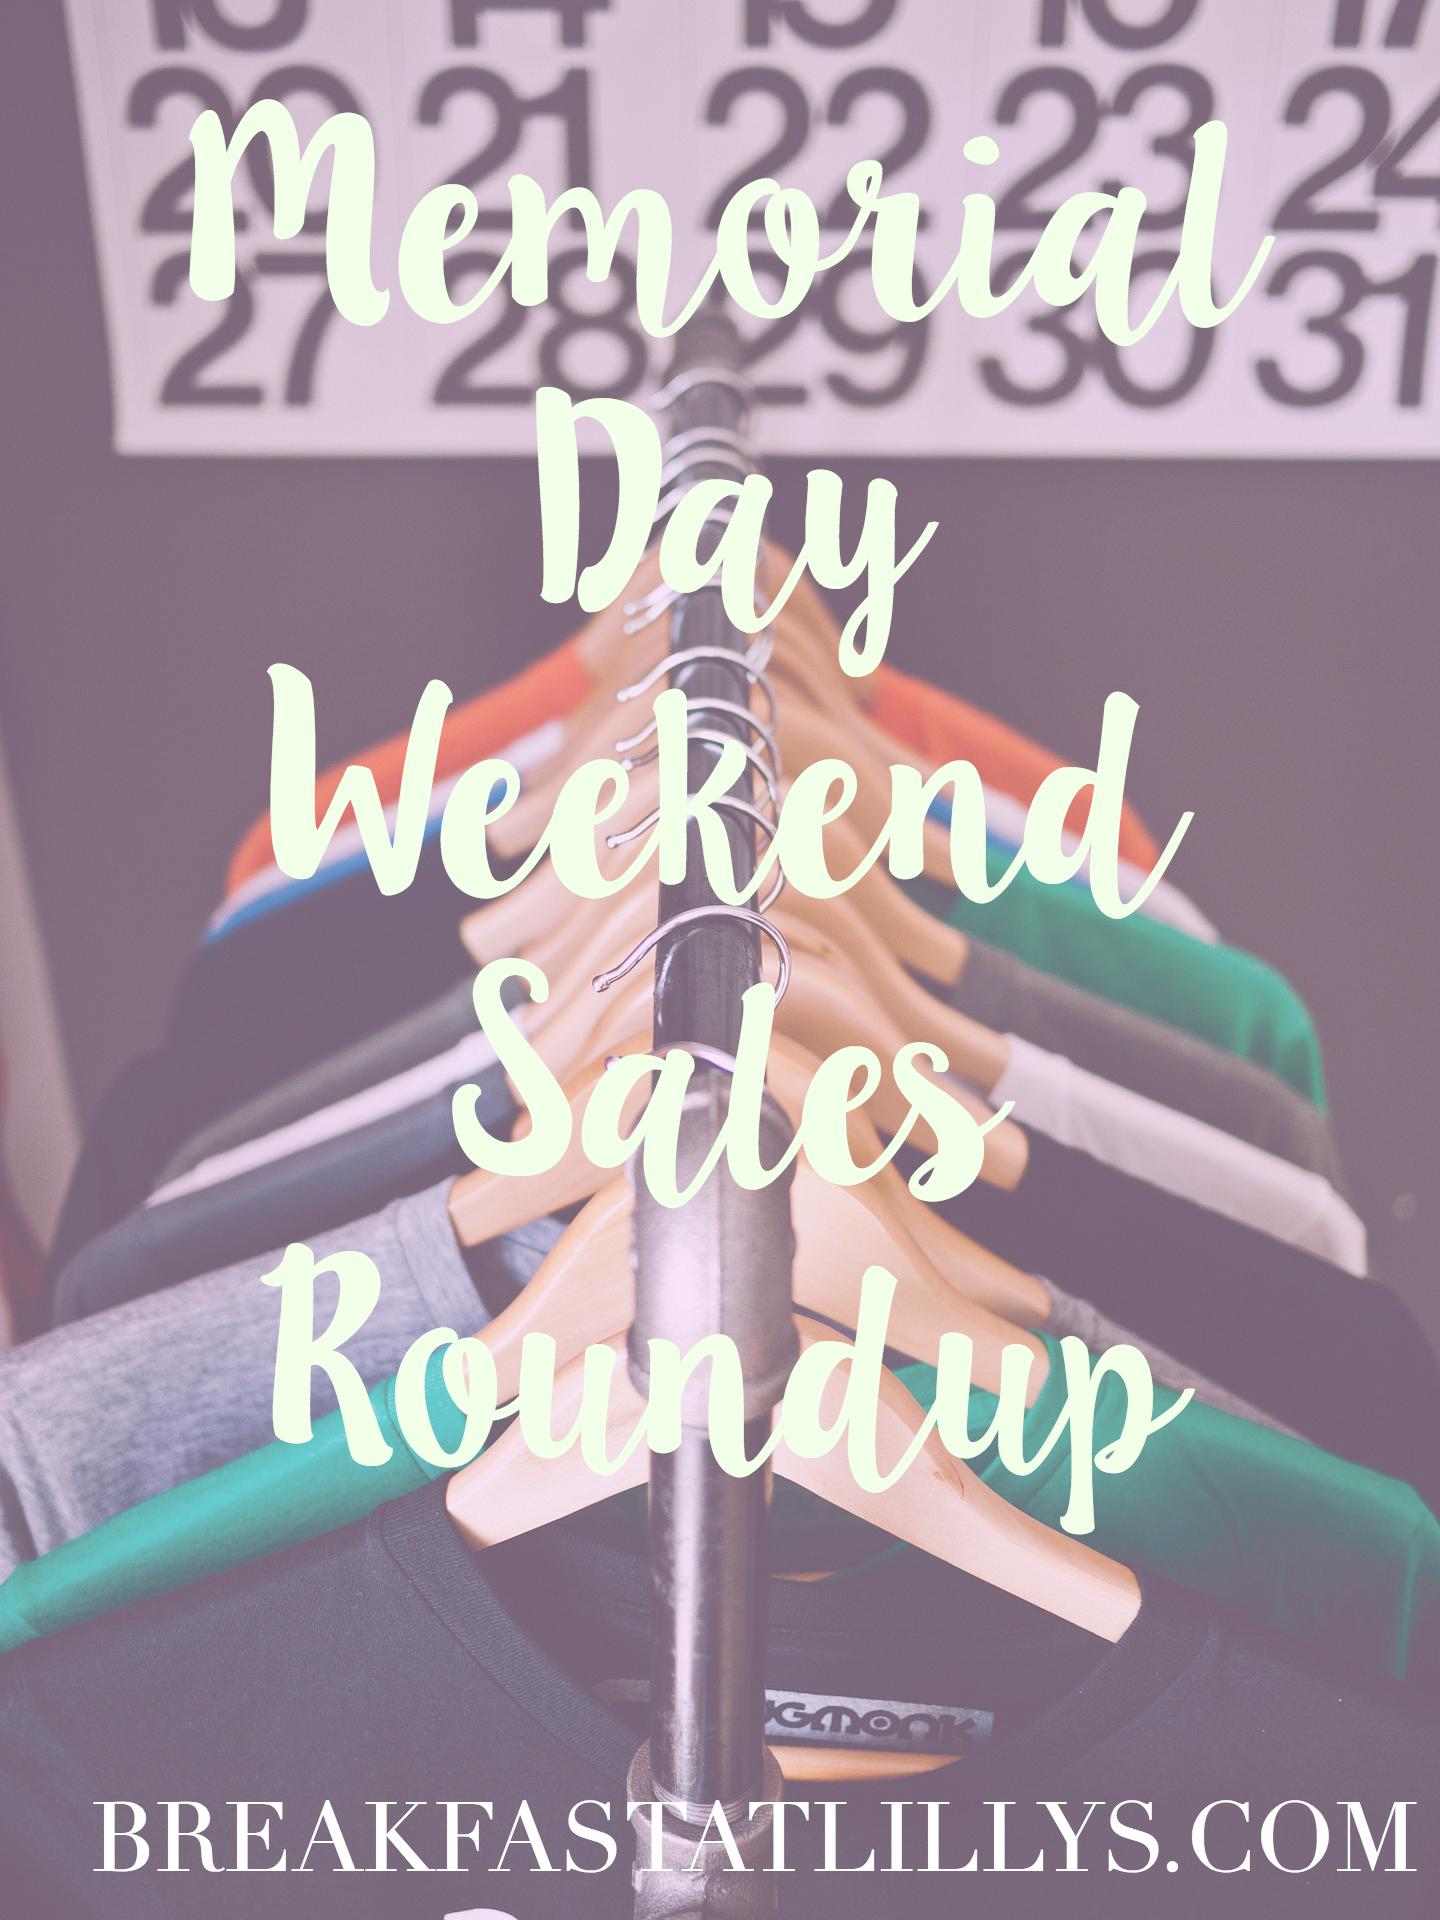 Memorial Day Weekend Sales Roundup